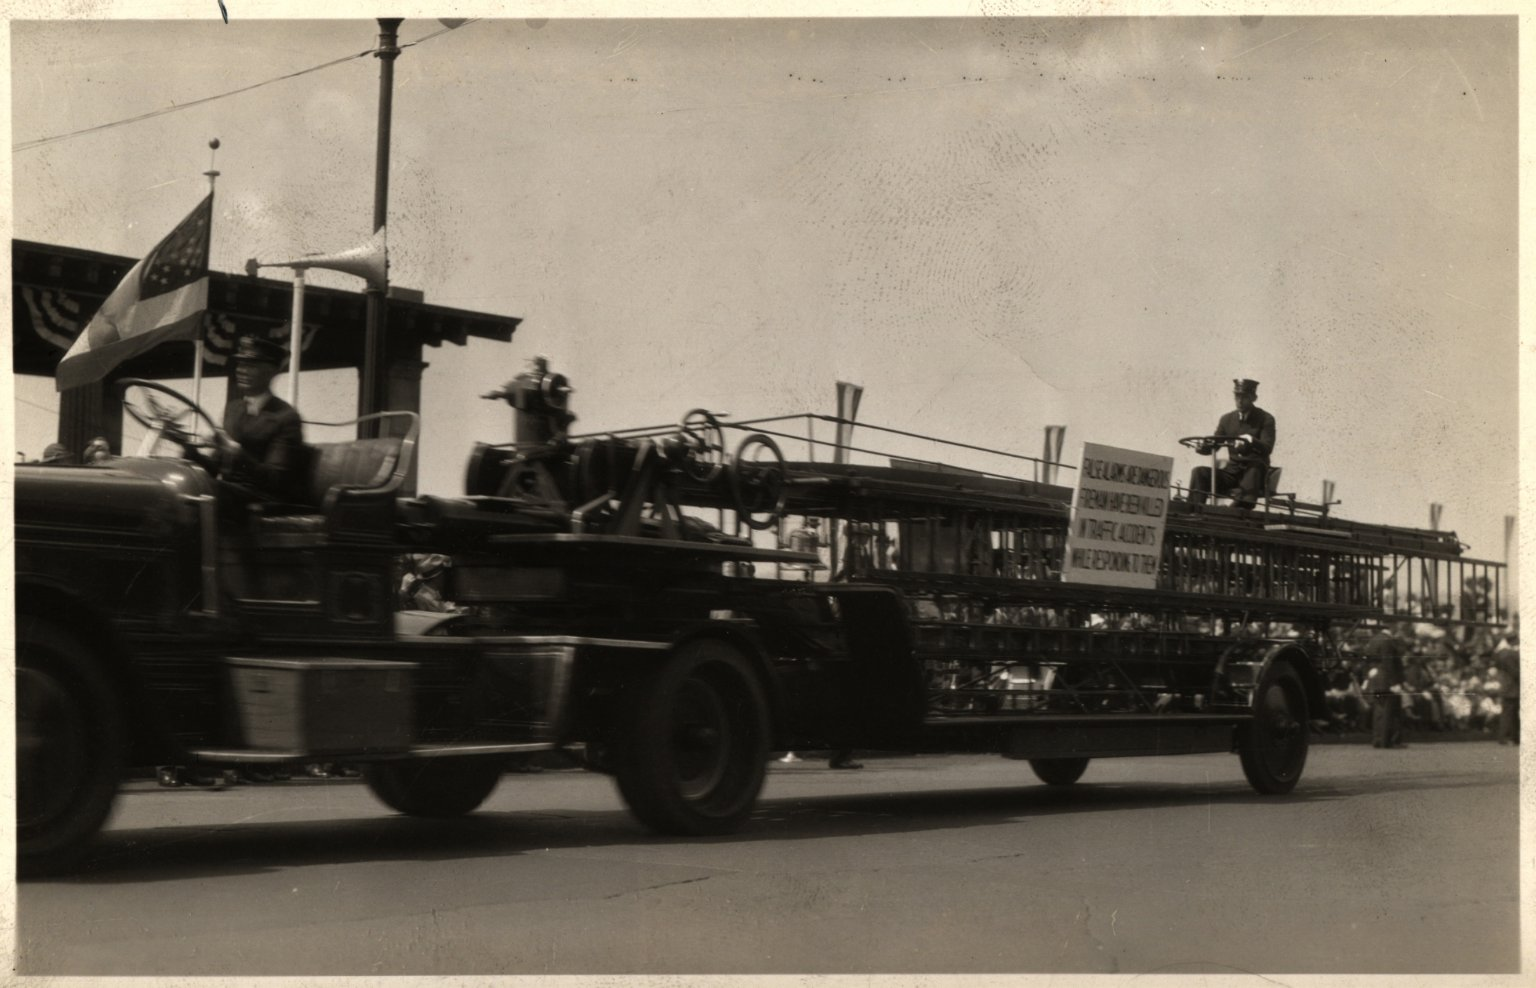 Пожарная автолестница на параде. Нью-Йорк, США, 1936 год